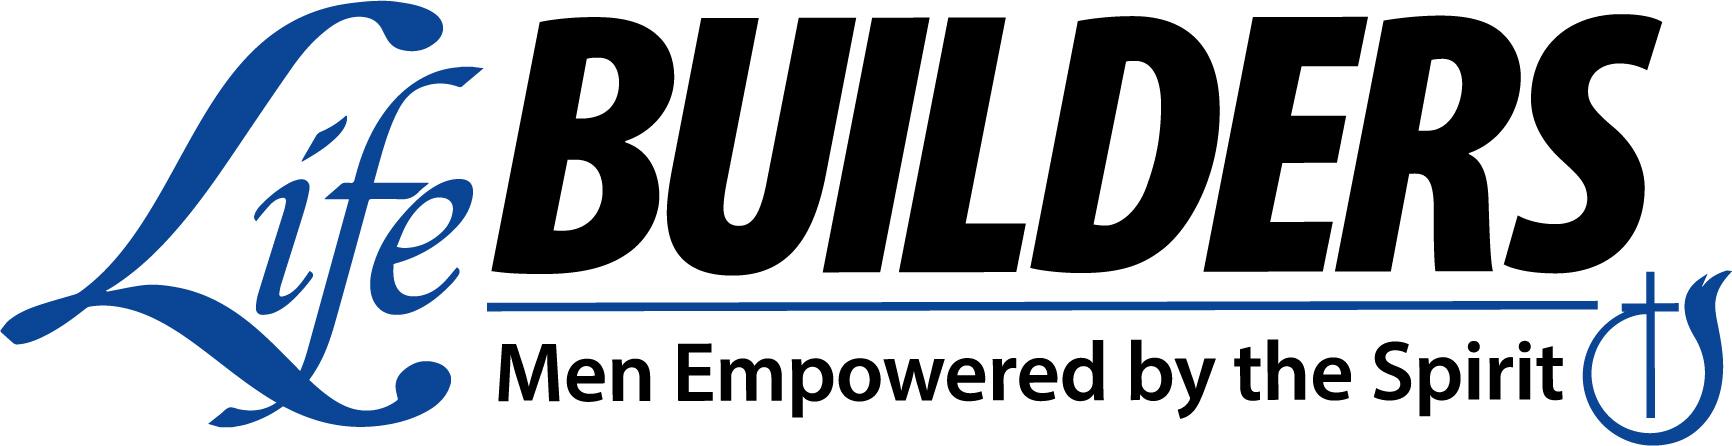 LifeBuilders-COG-2017-Logo.jpg